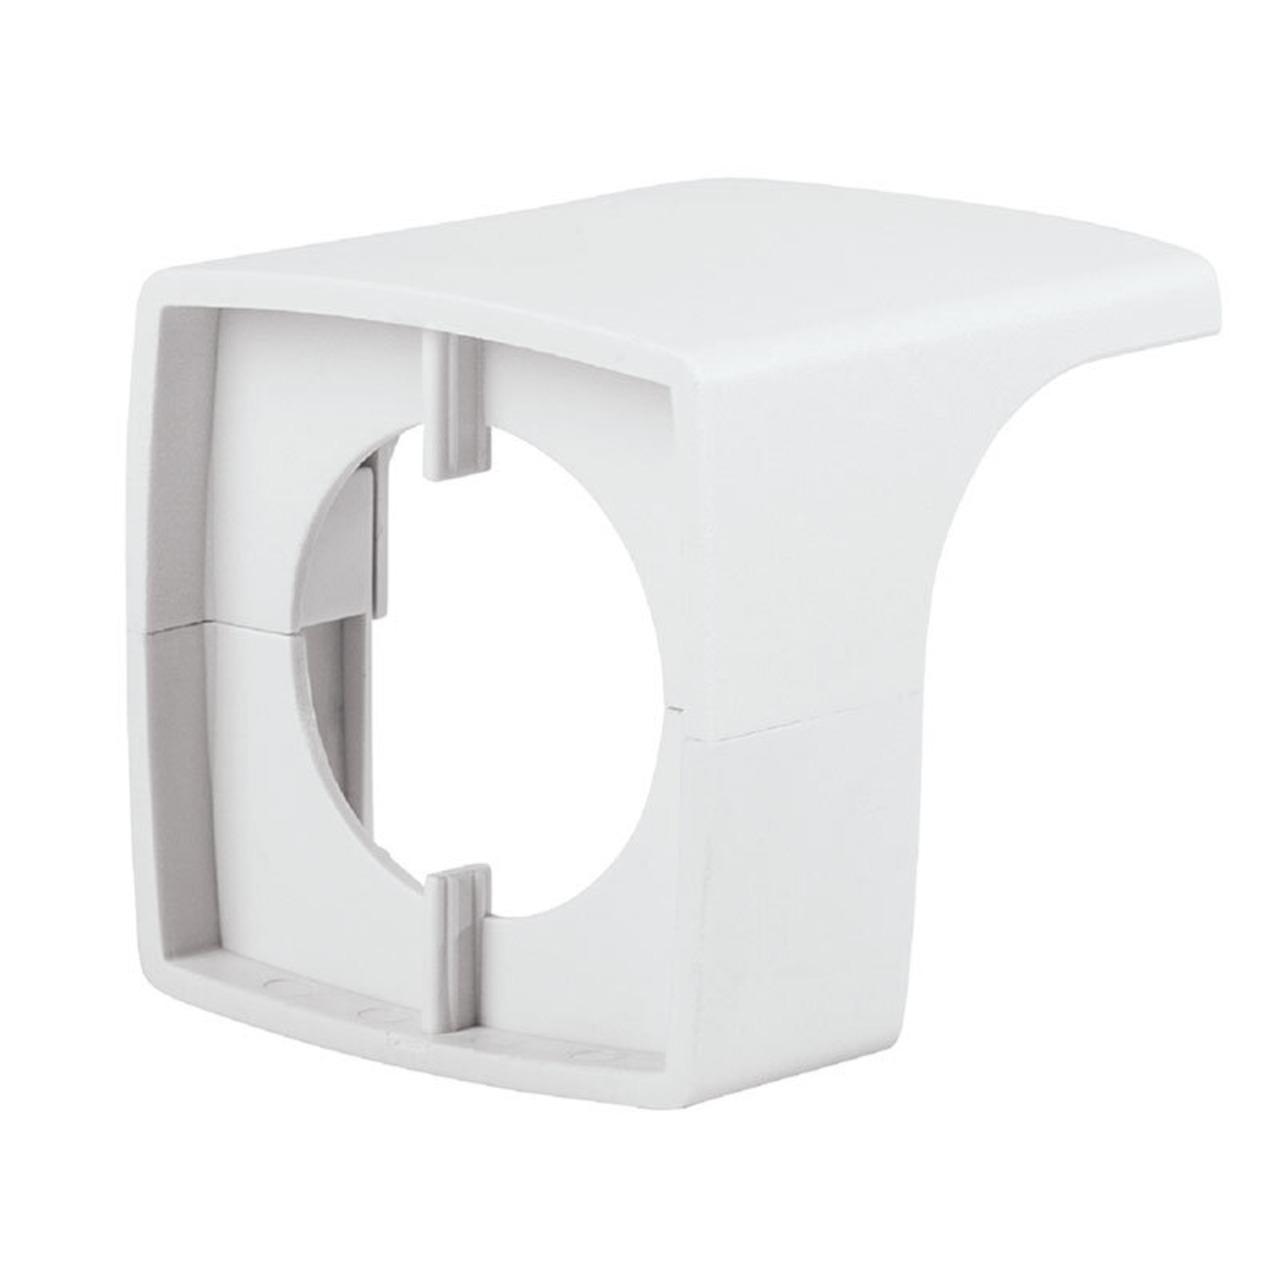 Homematic IP Smart Home Demontageschutz für Homematic IP Heizkörperthermostat kompakt- 5er Pack